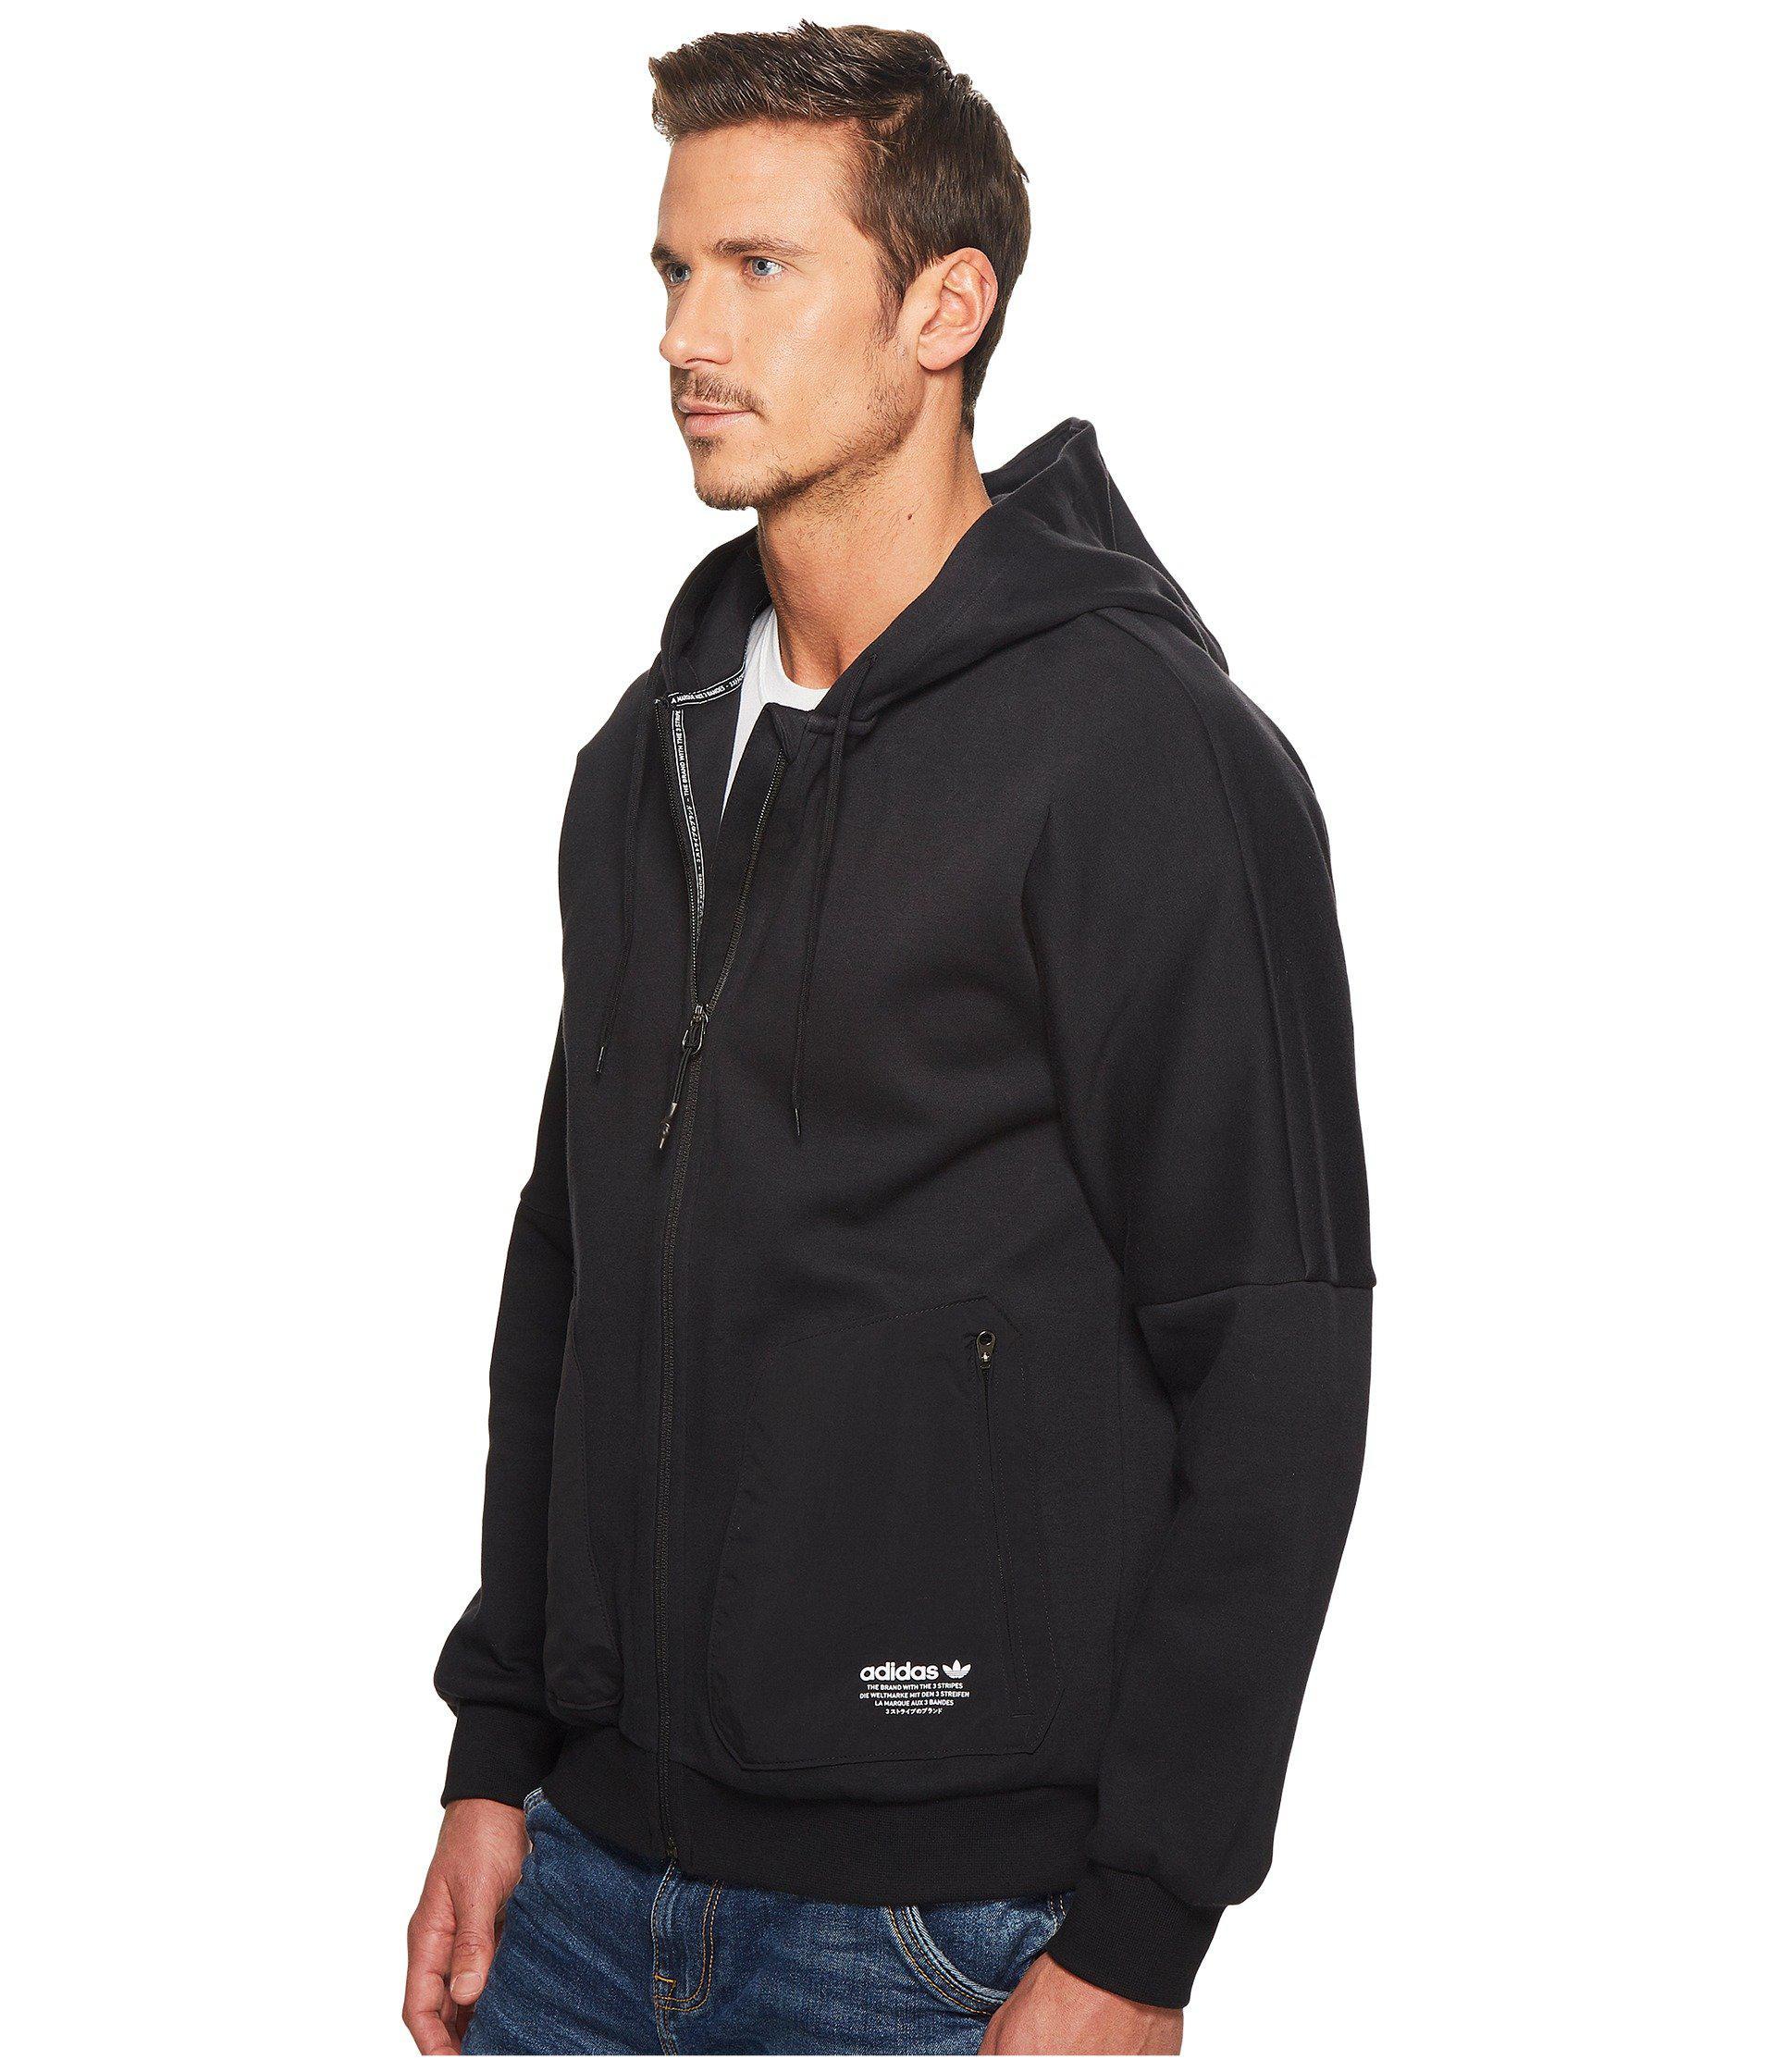 Adidas Originals Black Nmd Fz Hoodie for men